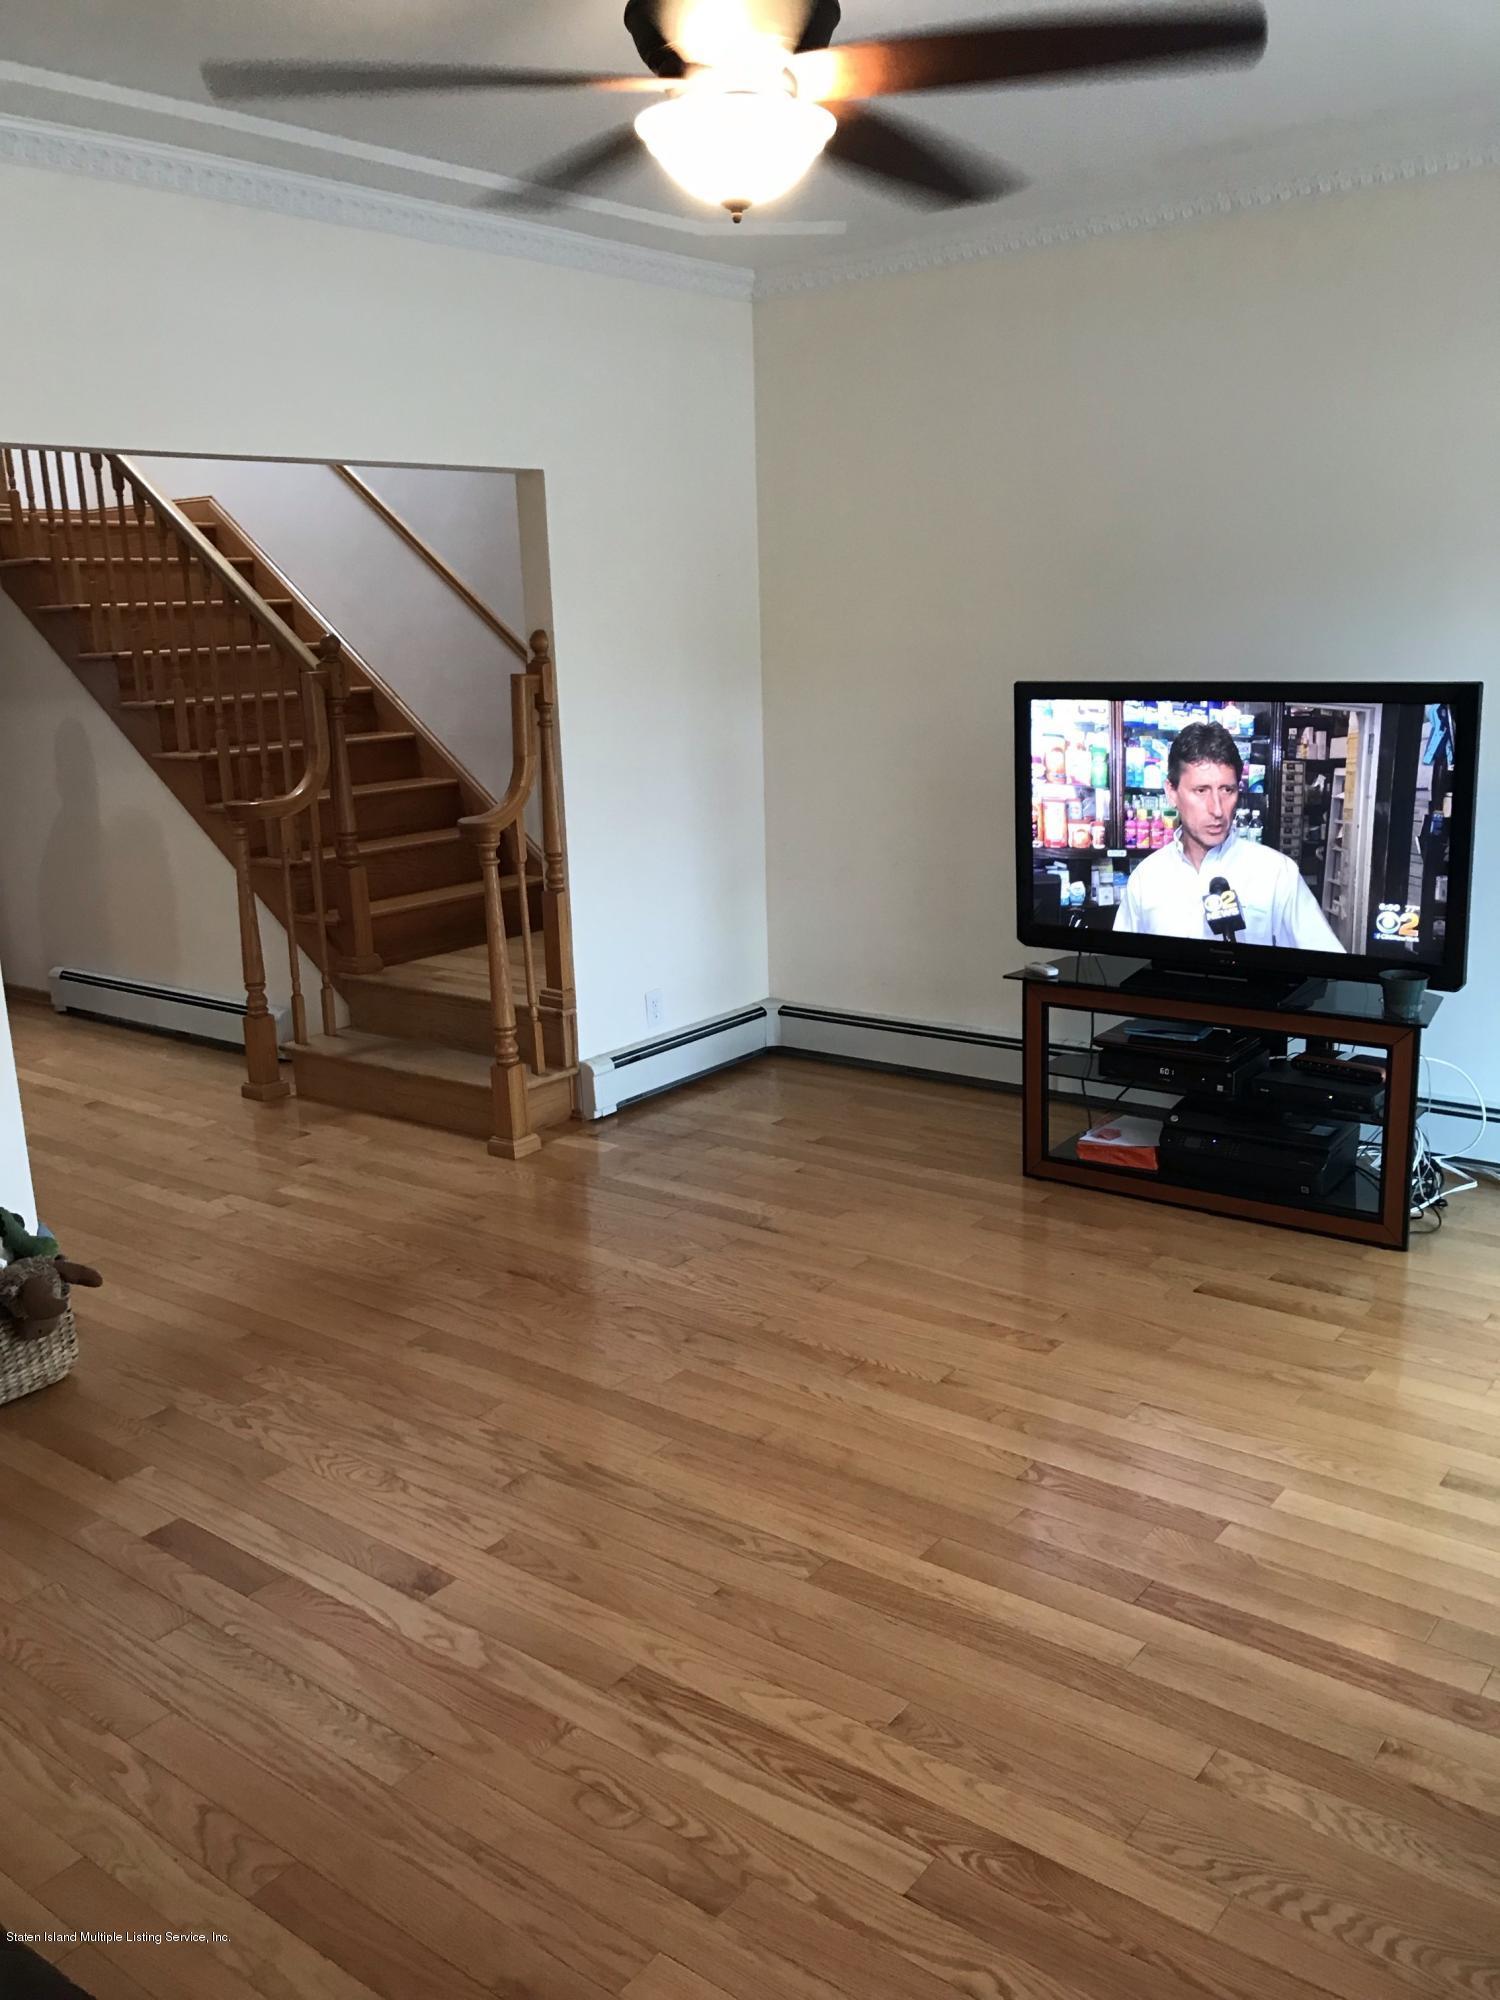 Single Family - Detached 241 Wiman Avenue  Staten Island, NY 10308, MLS-1129646-2